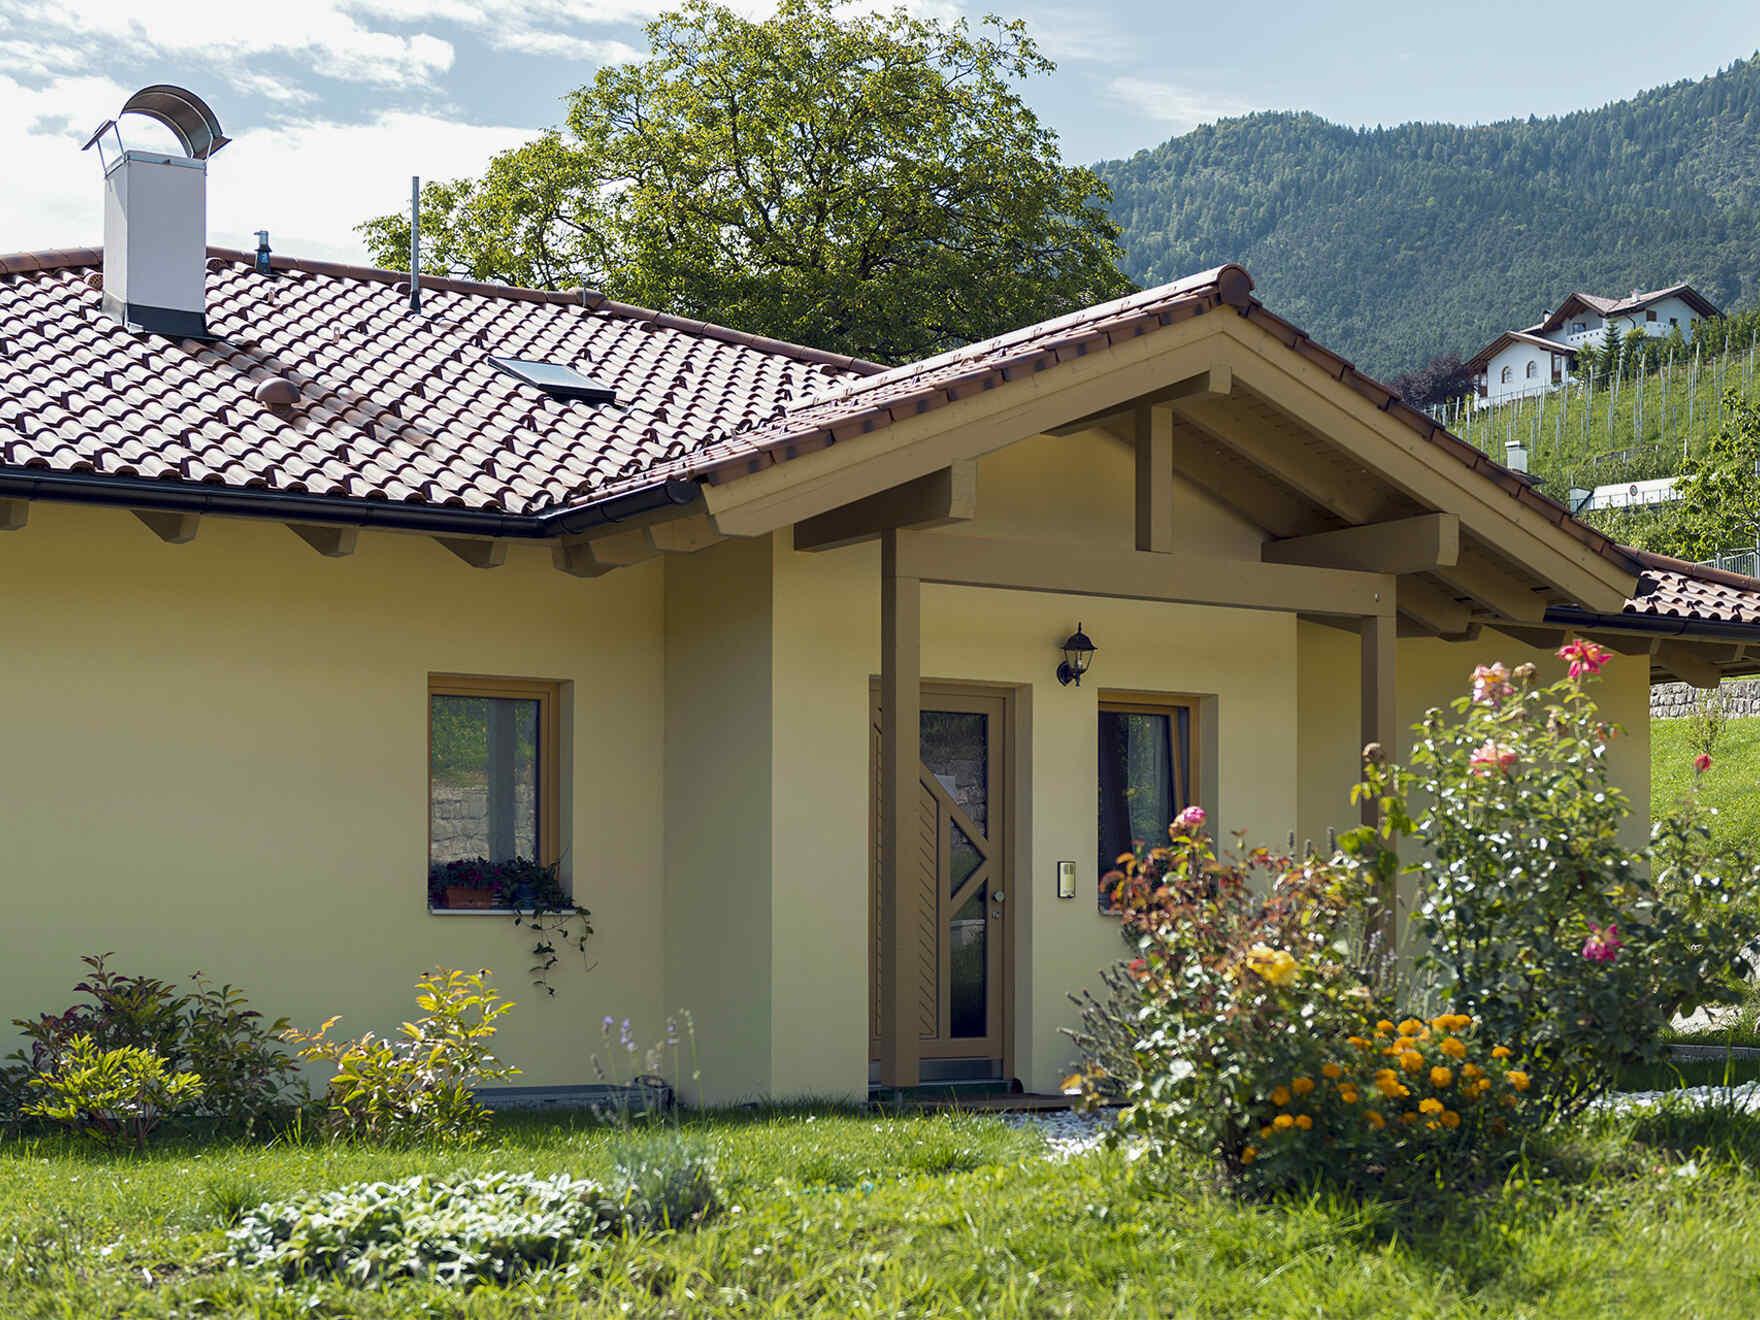 Maison préfabriquée famiglia Grandi